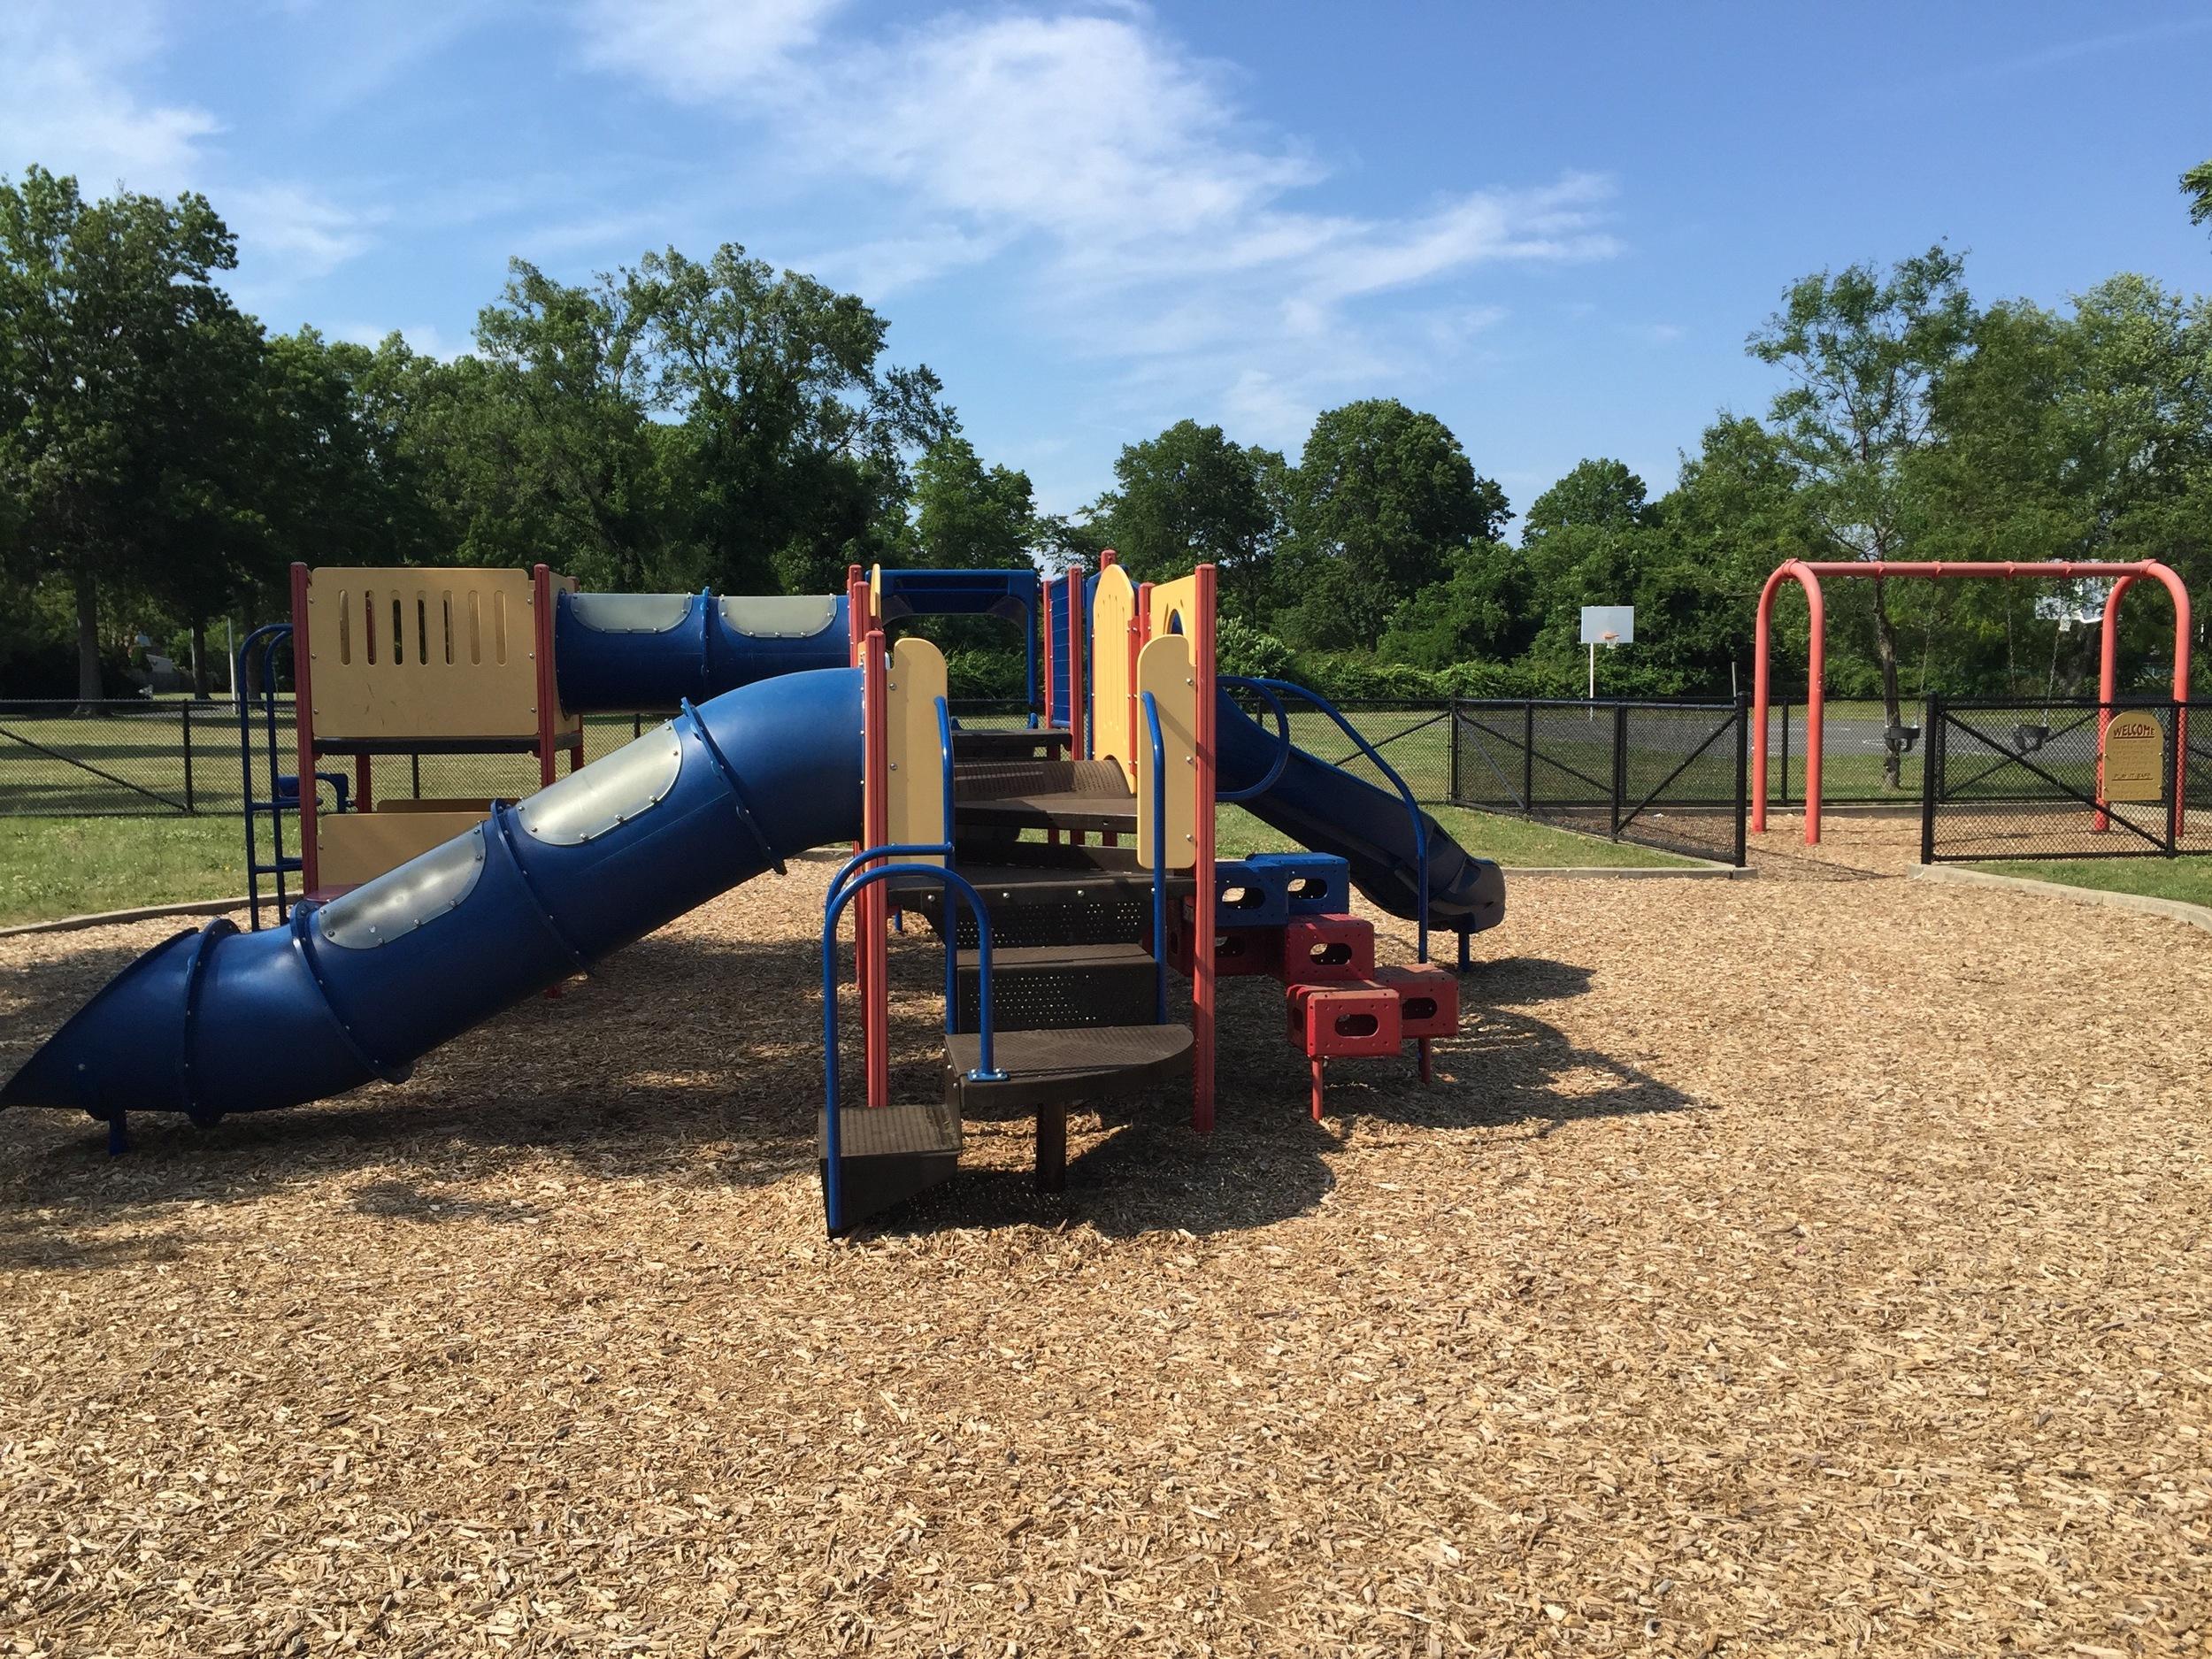 Playground at Duckpond Dr Park